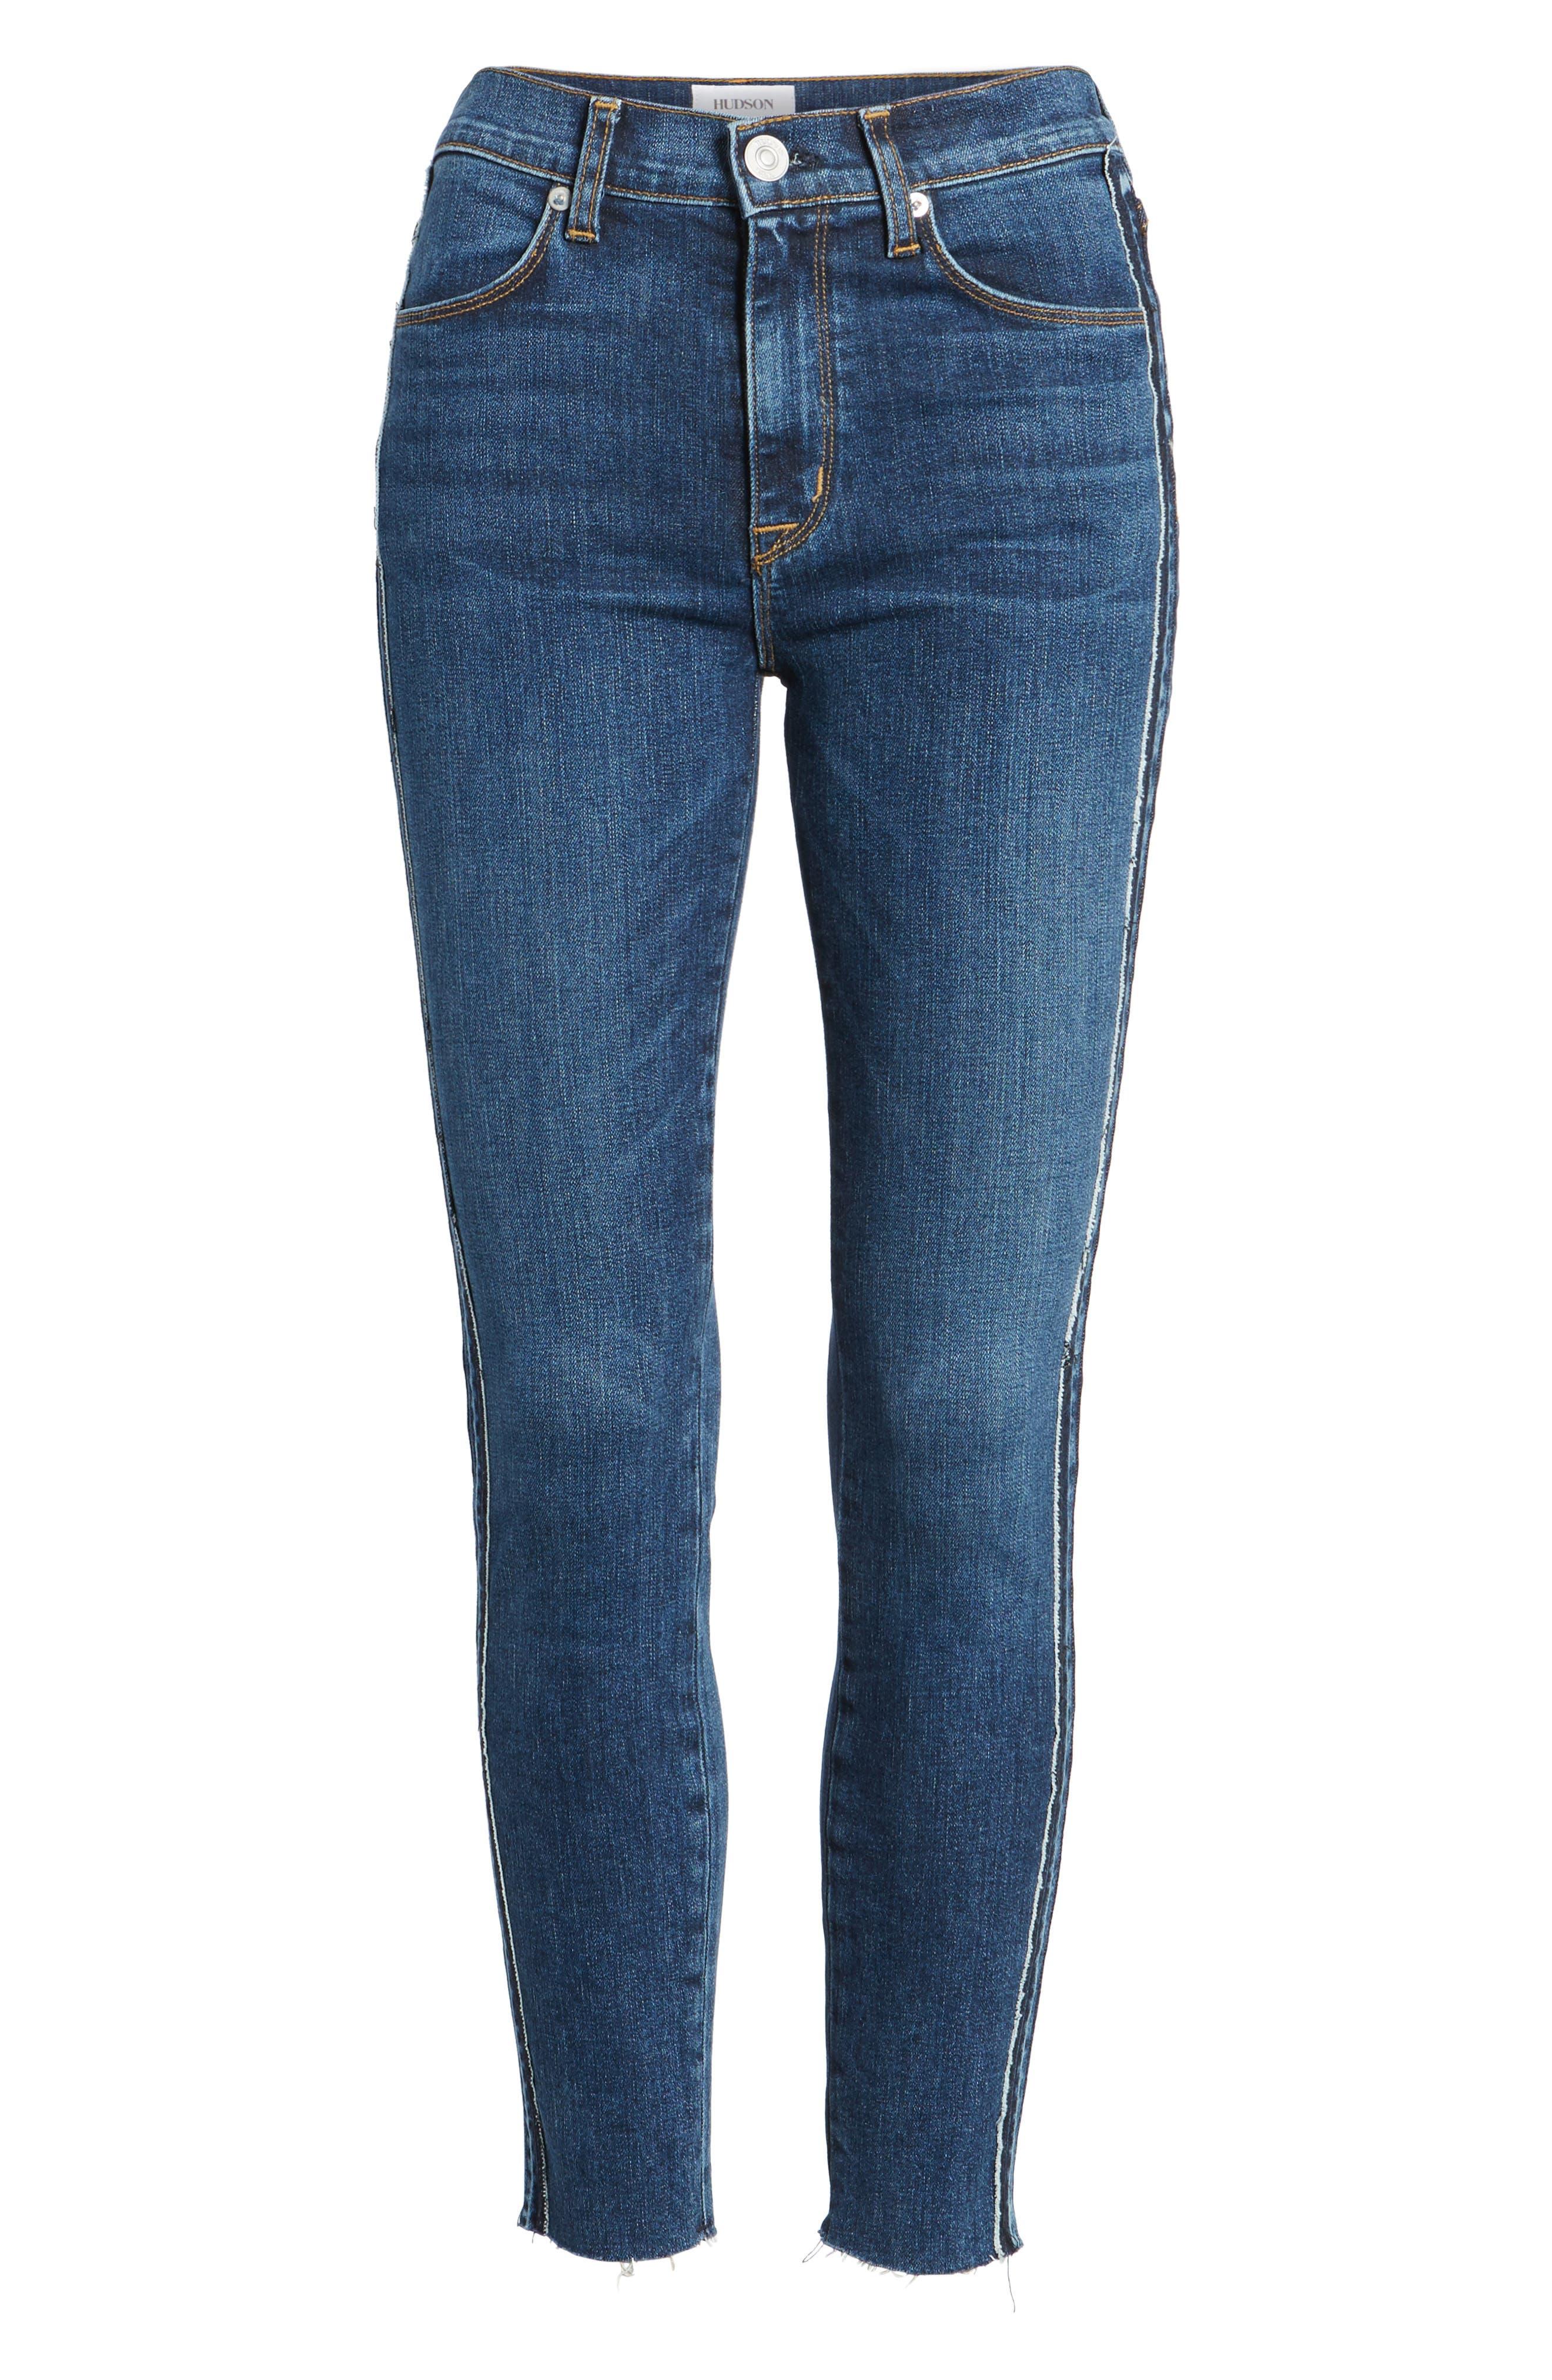 Barbara High Waist Super Skinny Jeans,                             Alternate thumbnail 7, color,                             400